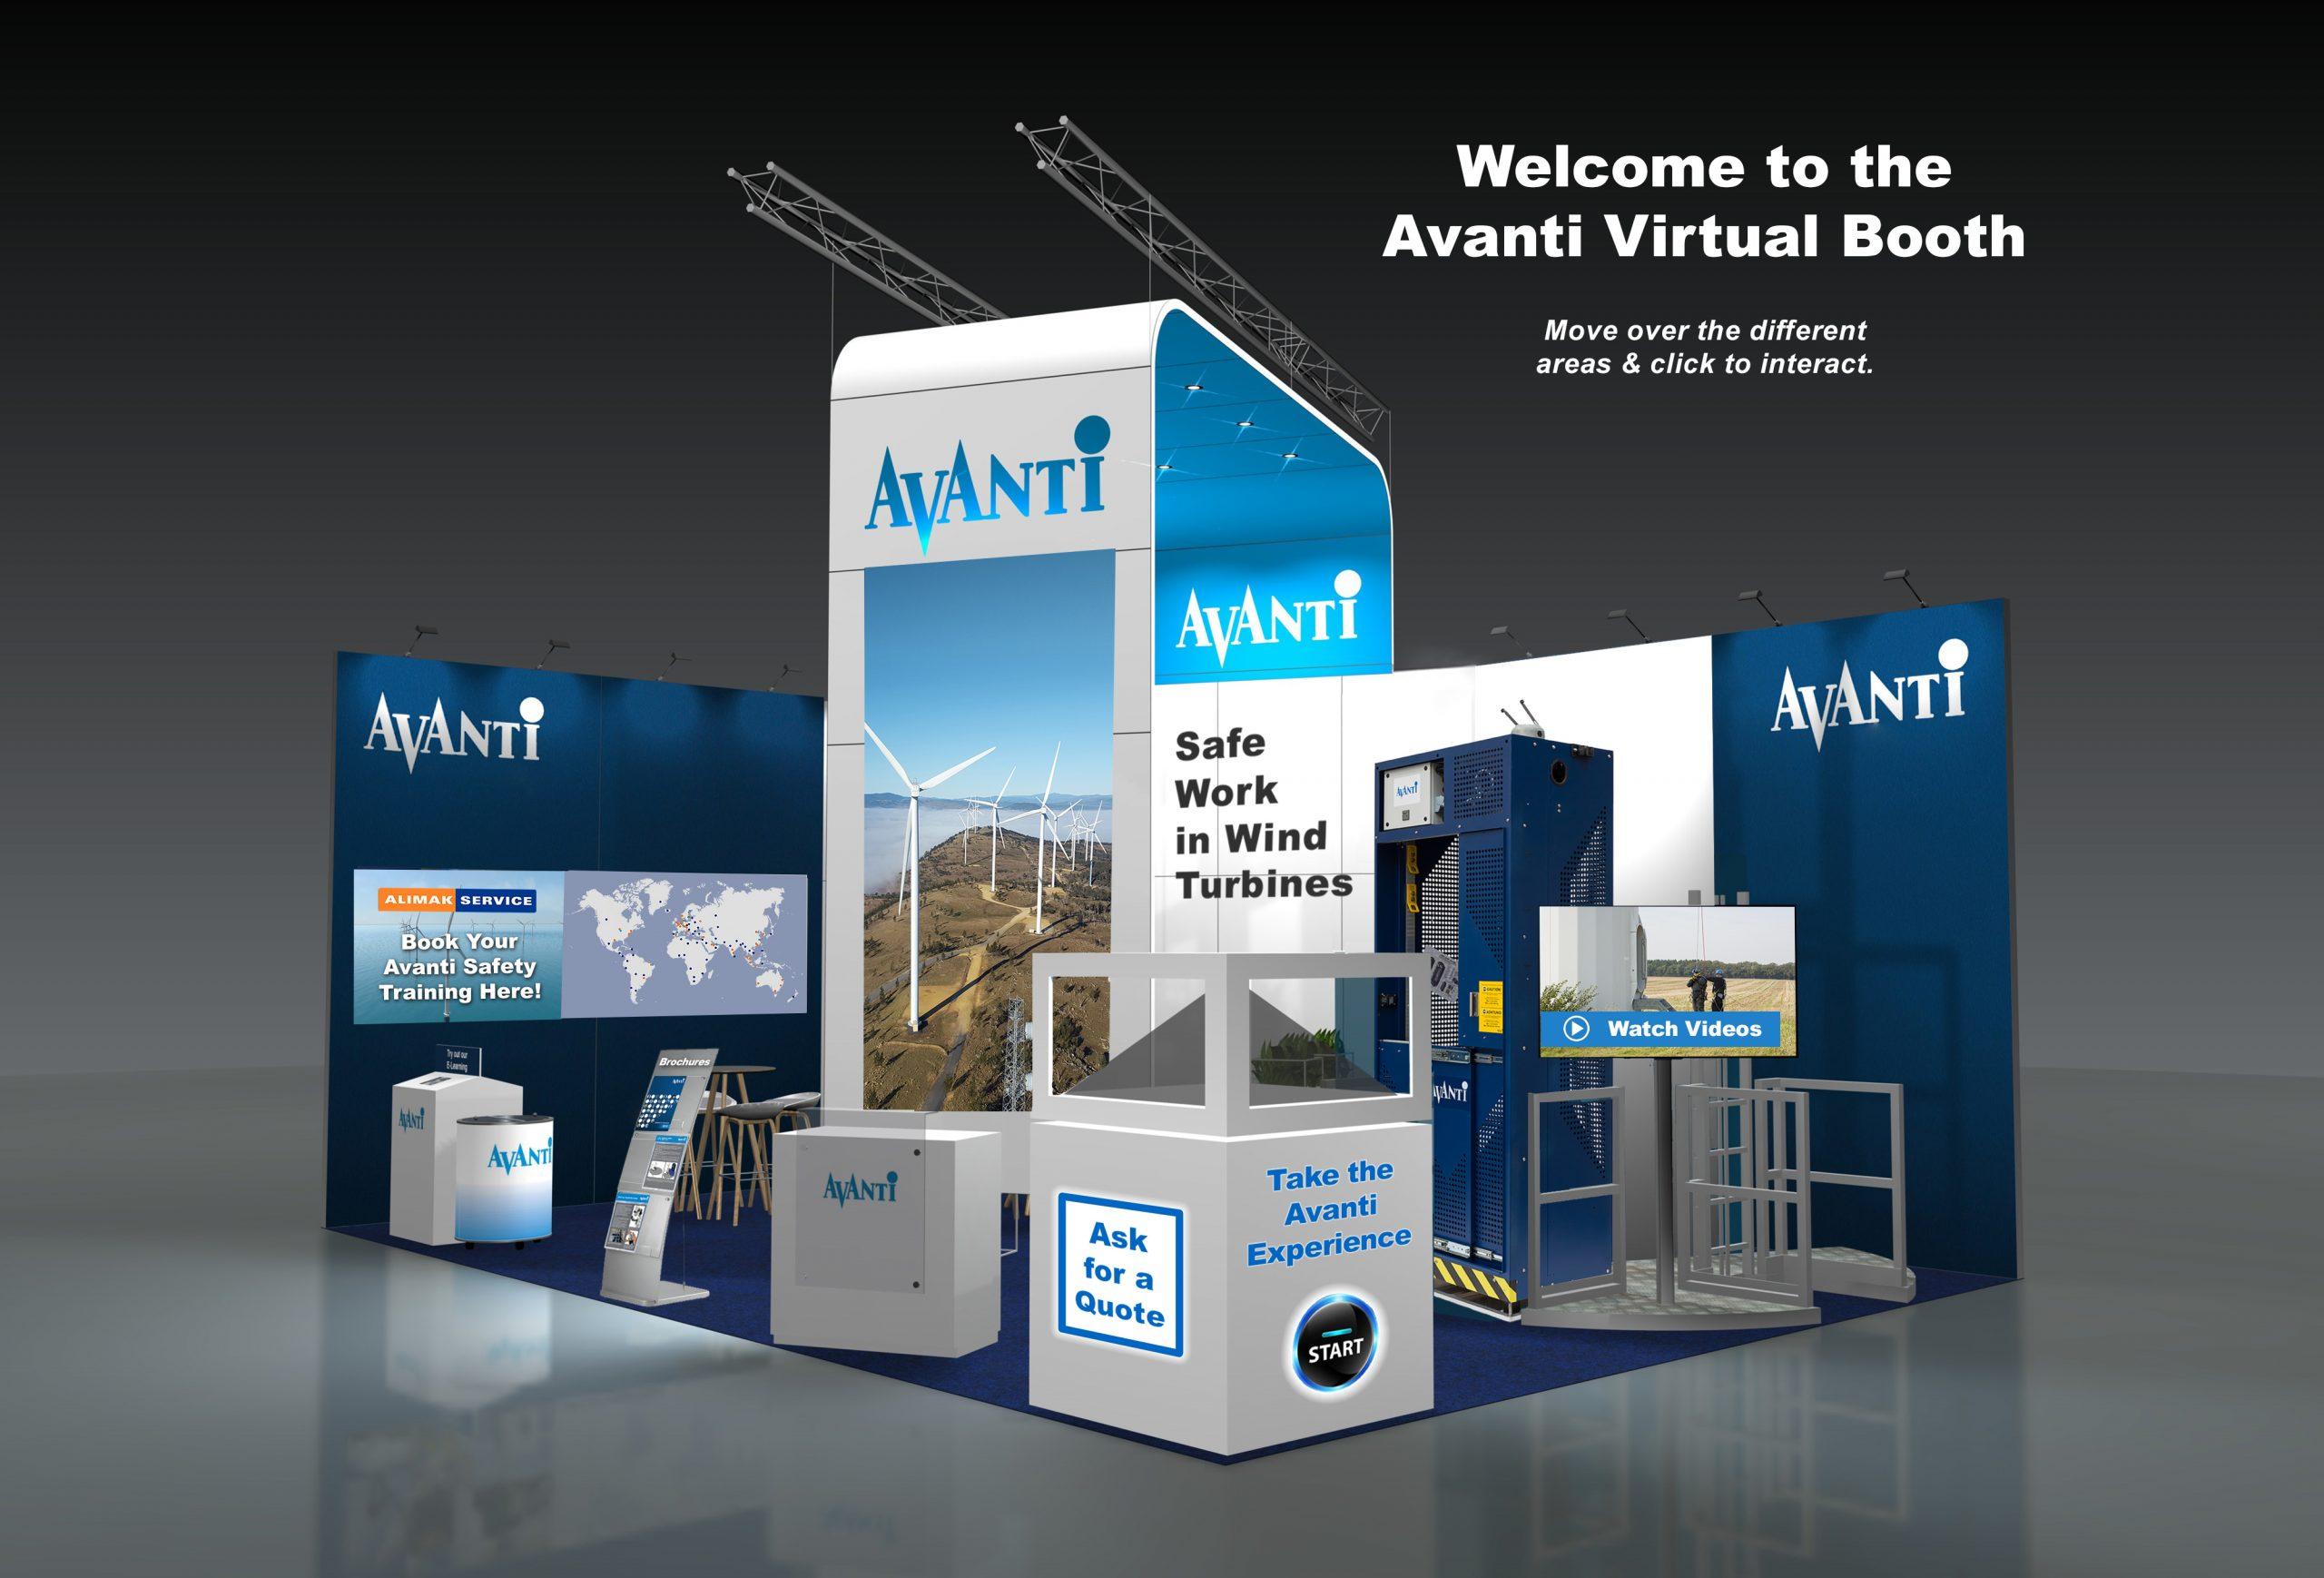 Avanti Virtual Booth